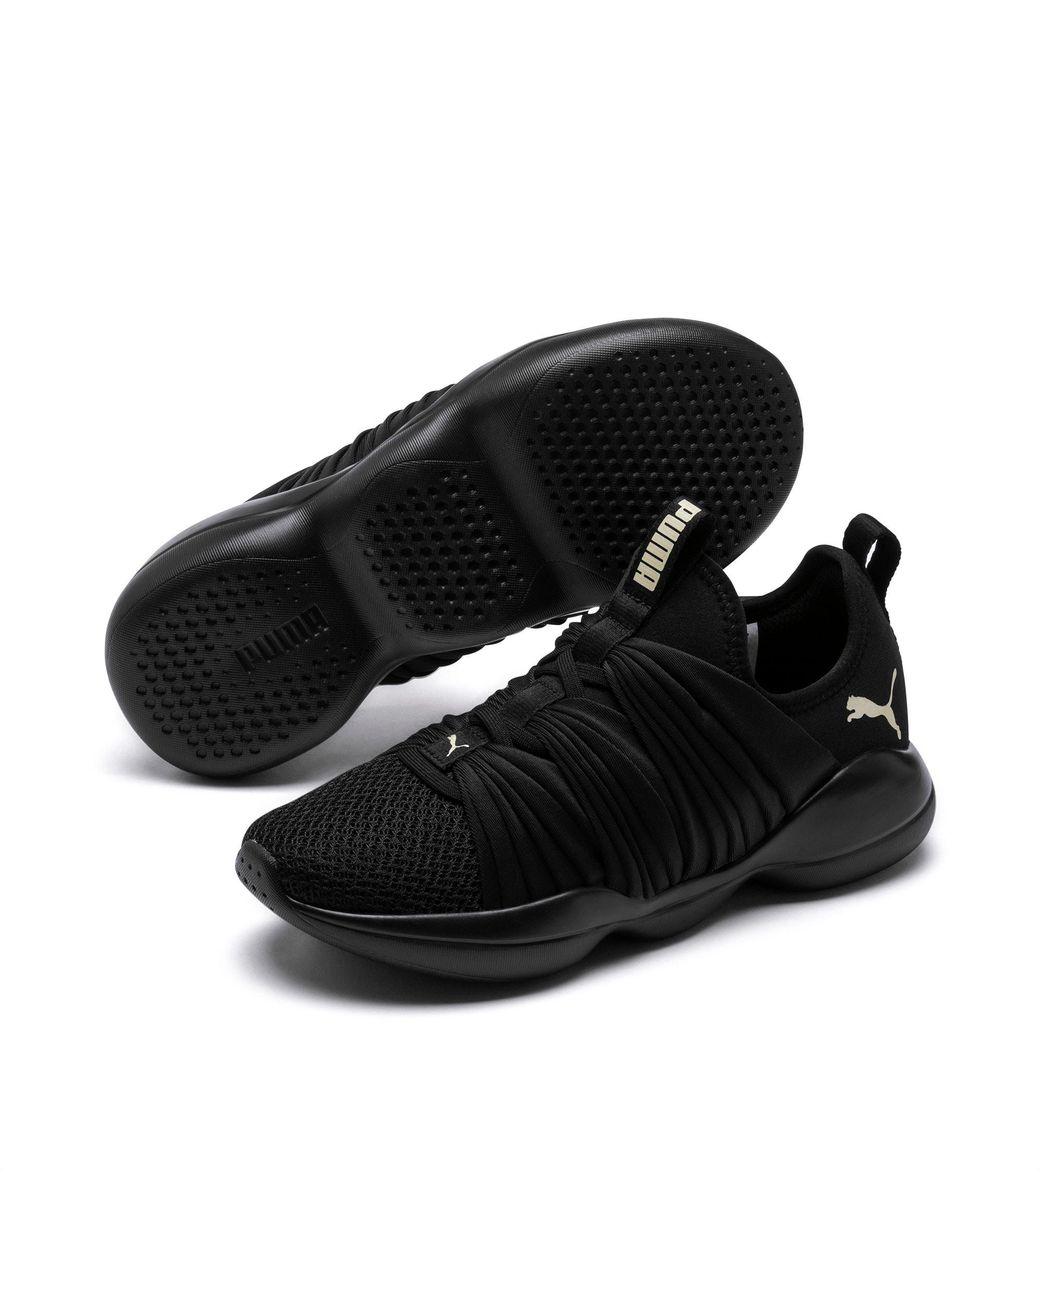 PUMA Flourish Women's Training Shoes in 01 (Black) Lyst